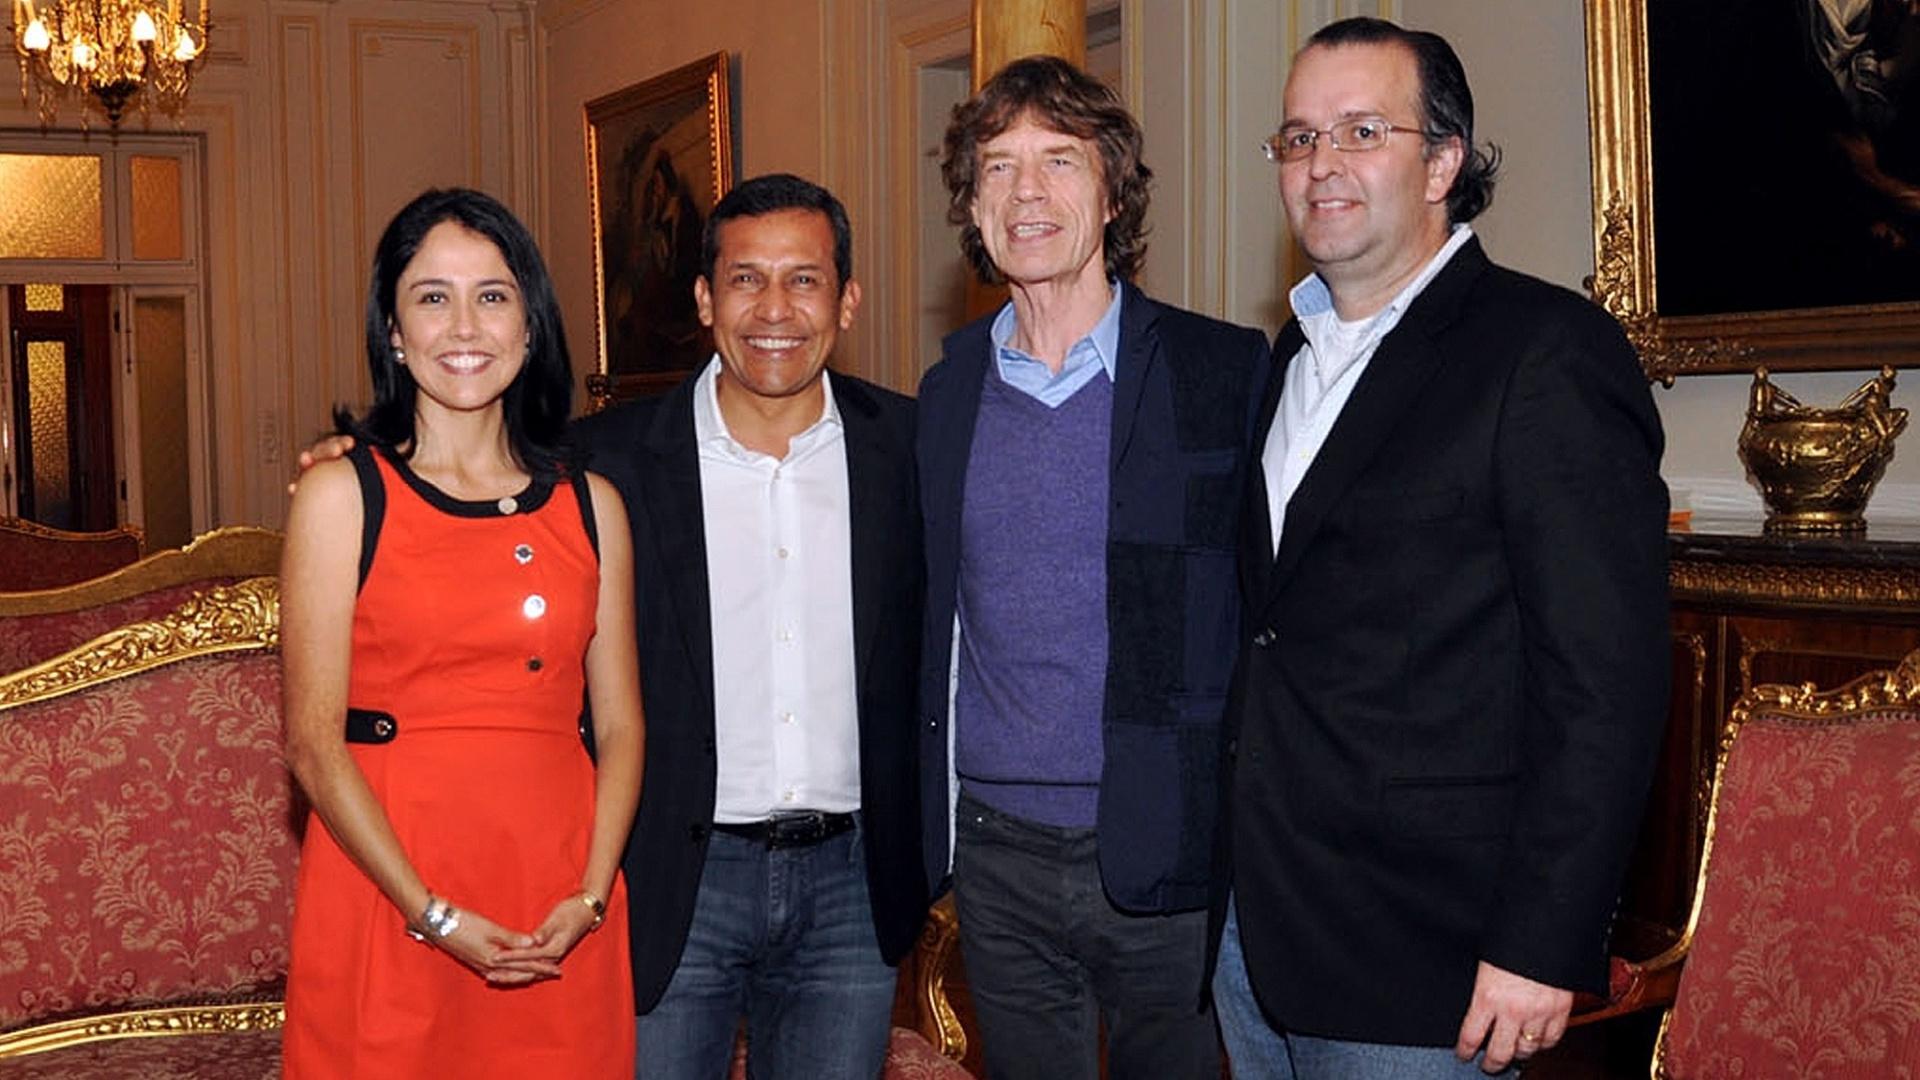 Mick Jagger com presidente peruano Ollanta Humala, primeira dama Nadine Heredia (esq.) e José Luis Silva (dir.), ministro do Turismo do país